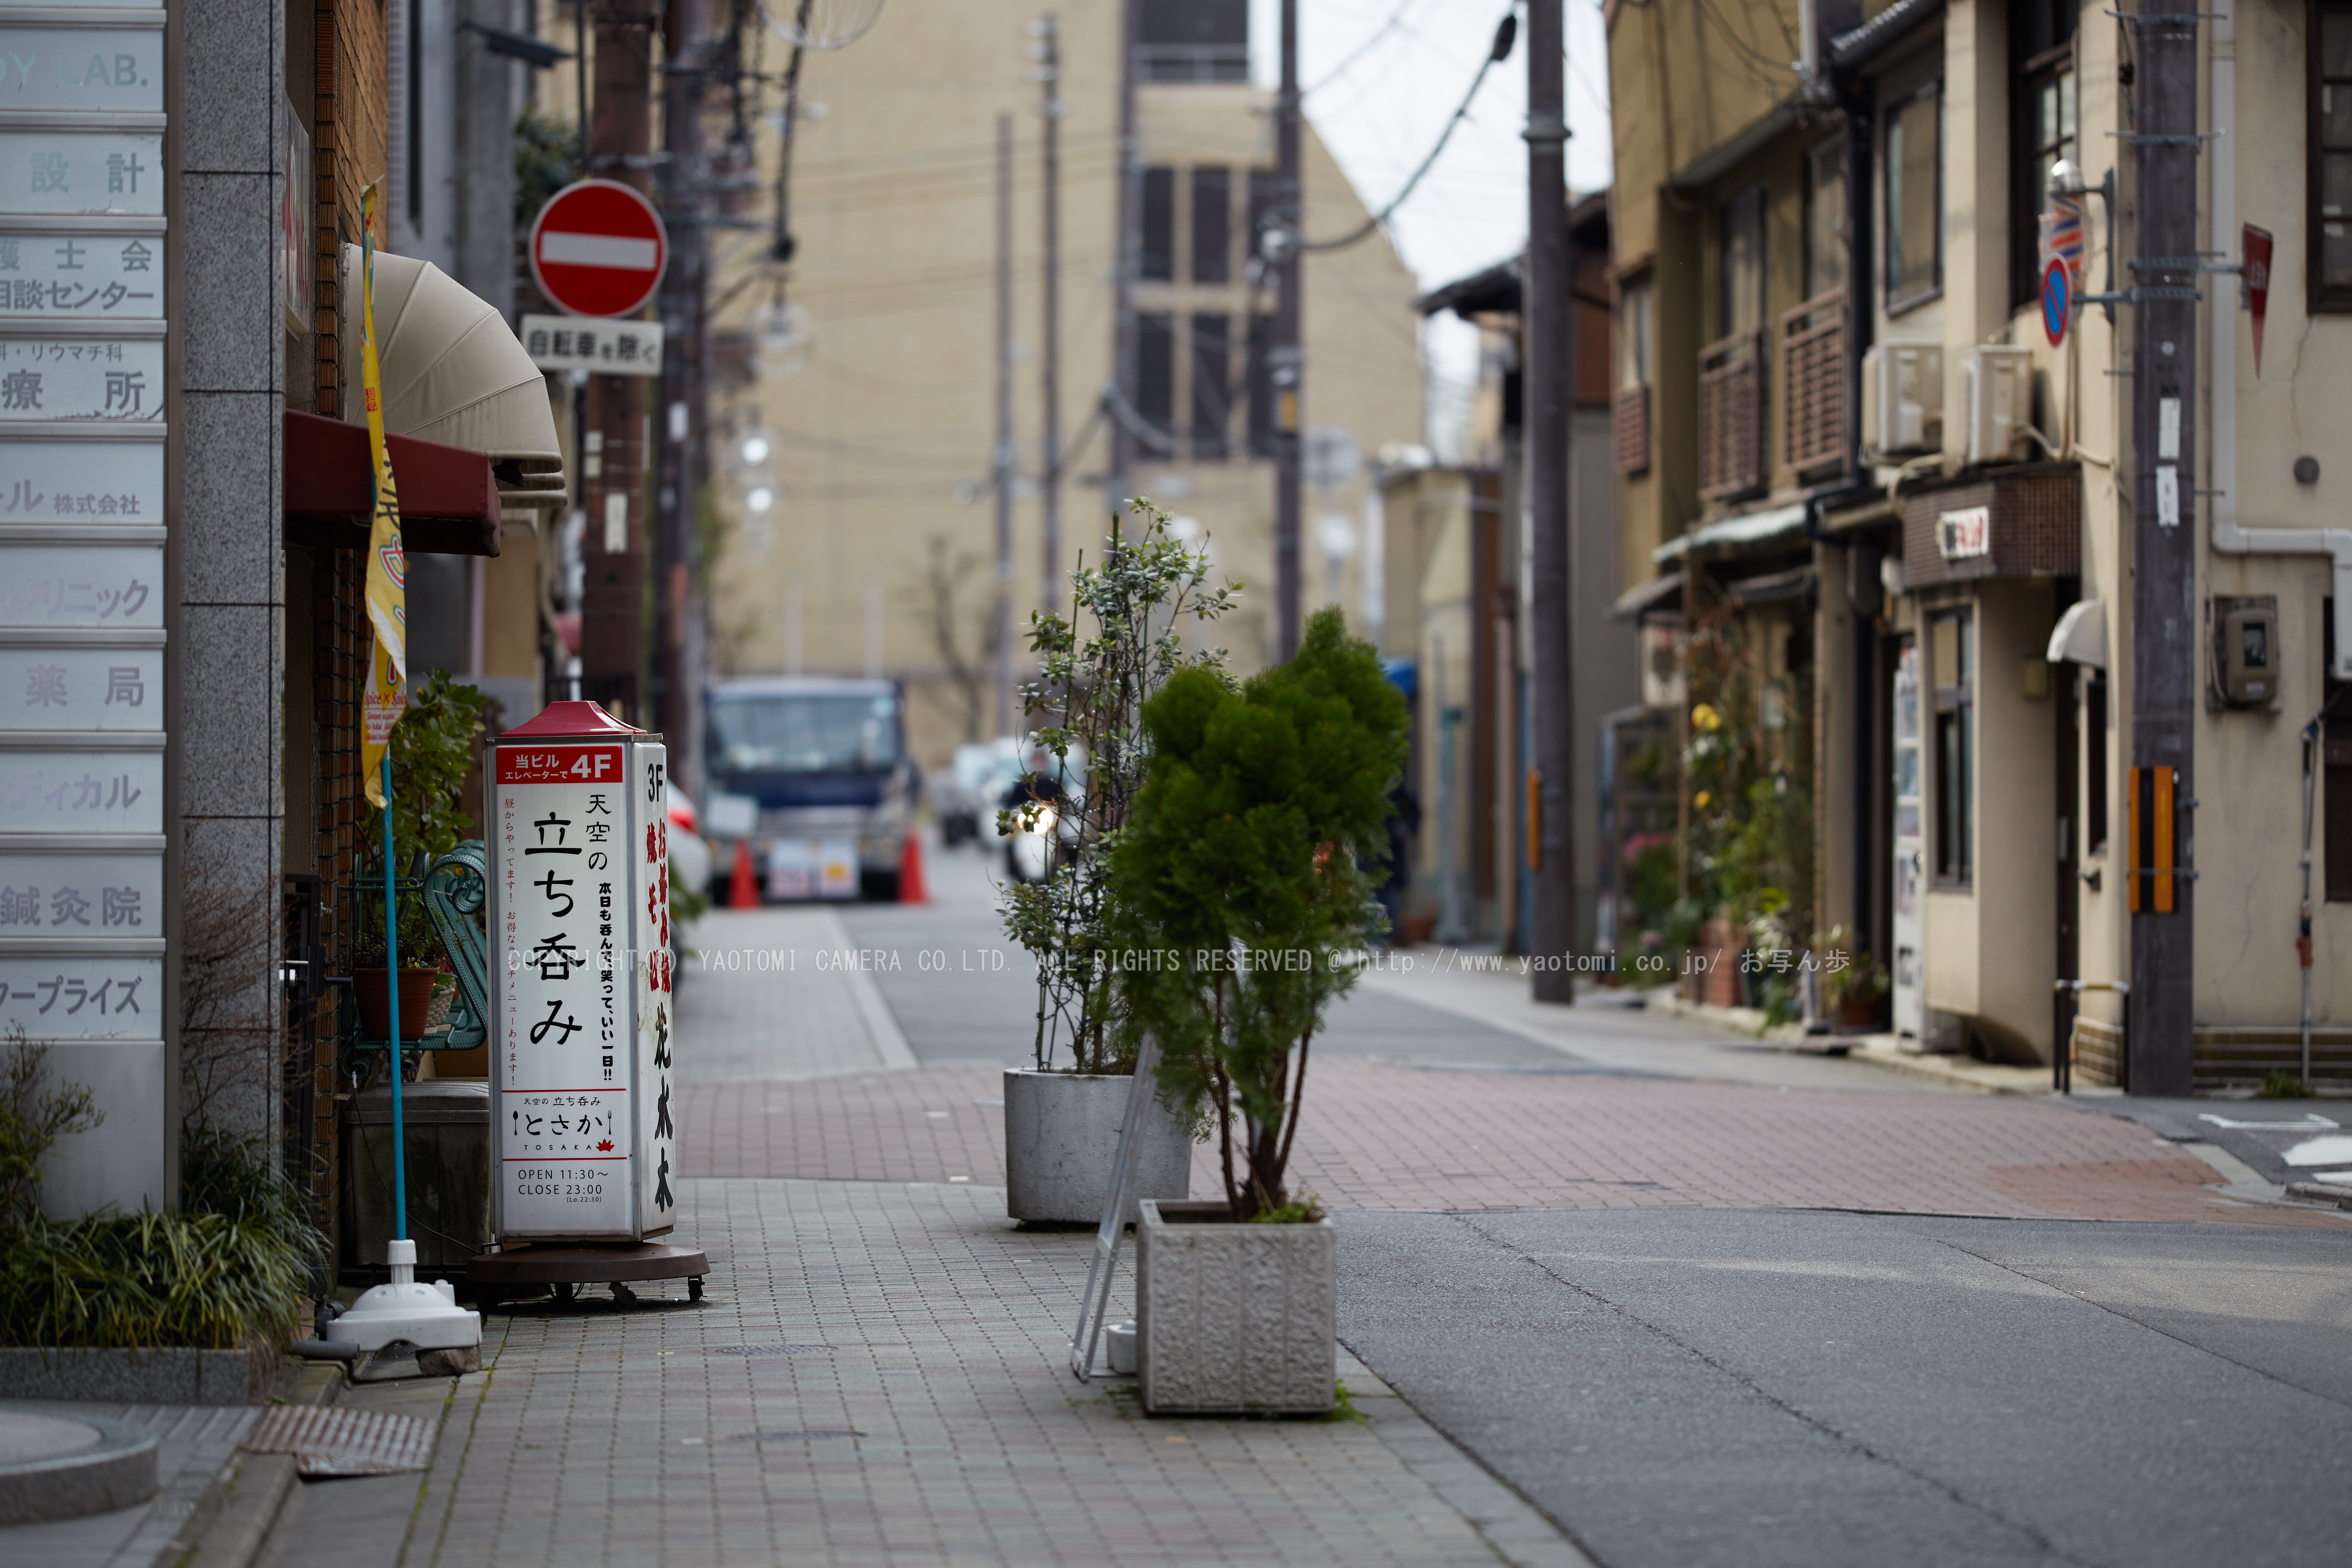 http://www.yaotomi.co.jp/blog/walk/%E9%95%B7%E5%BE%B3%E5%AF%BA%E3%81%8A%E3%81%8B%E3%82%81%E6%A1%9C_IMG_7030_F%2C2017yaotomi.jpg